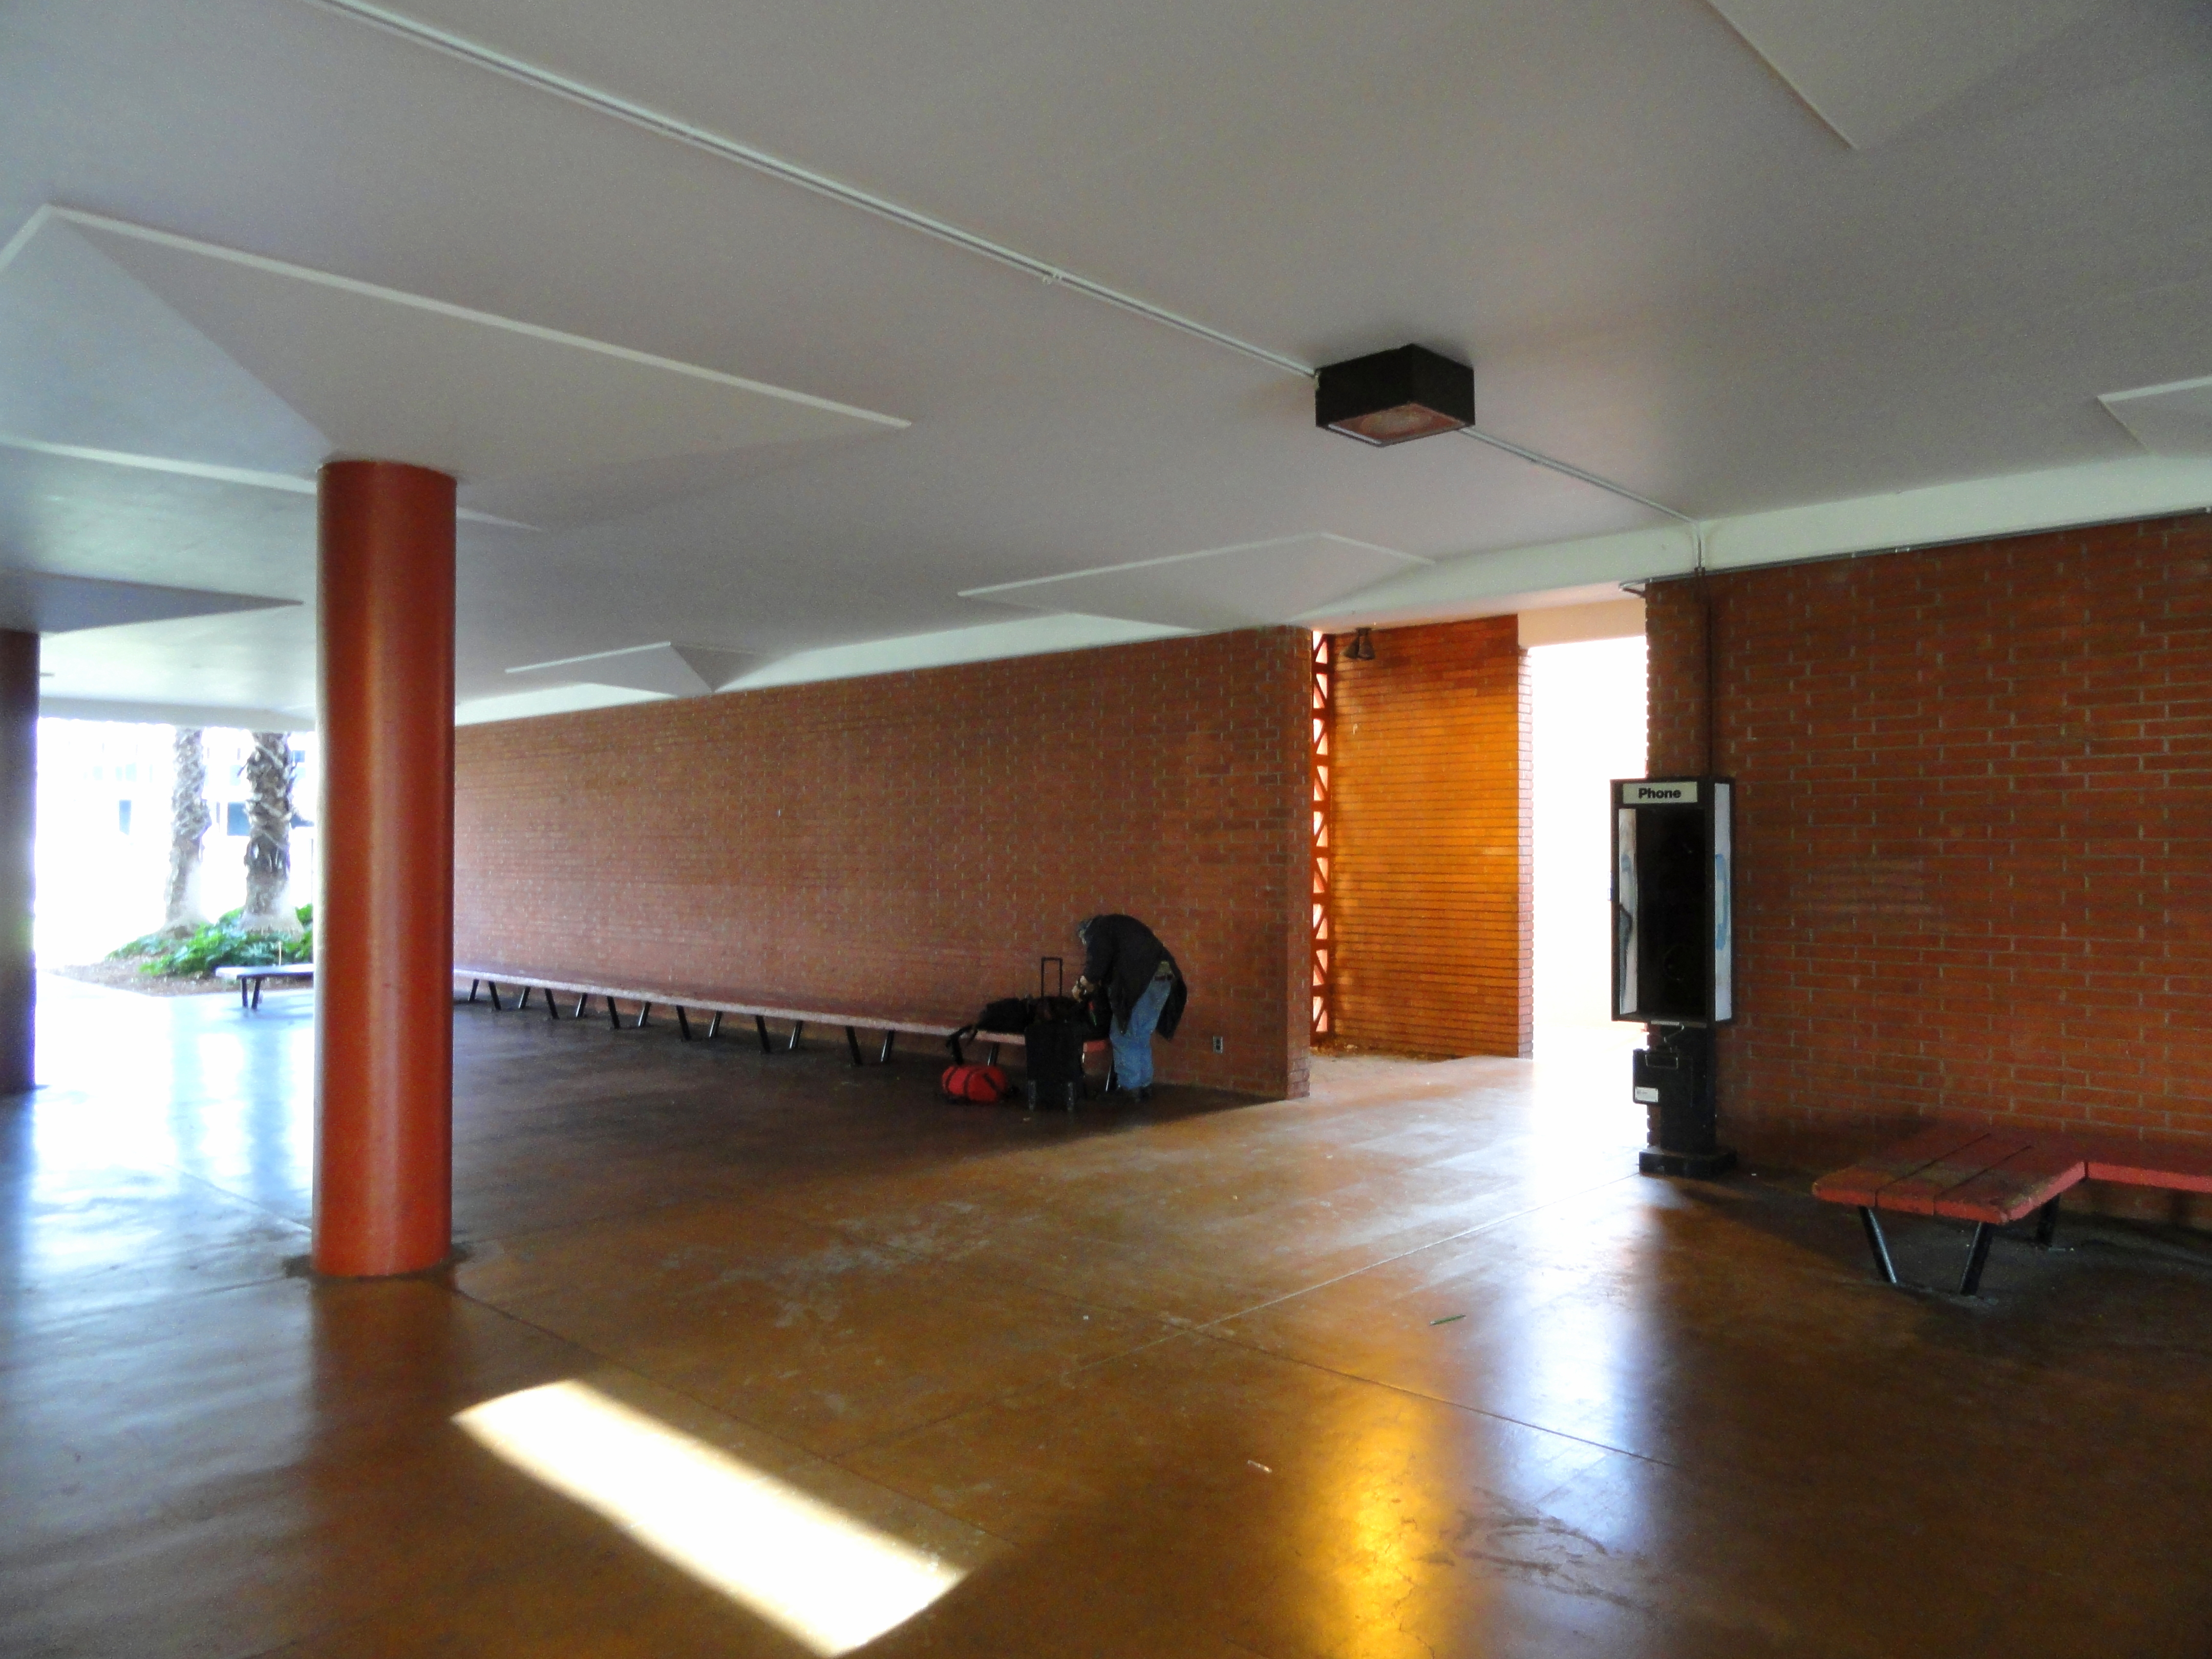 Filesan José State University Dsc03941jpg Wikimedia Commons